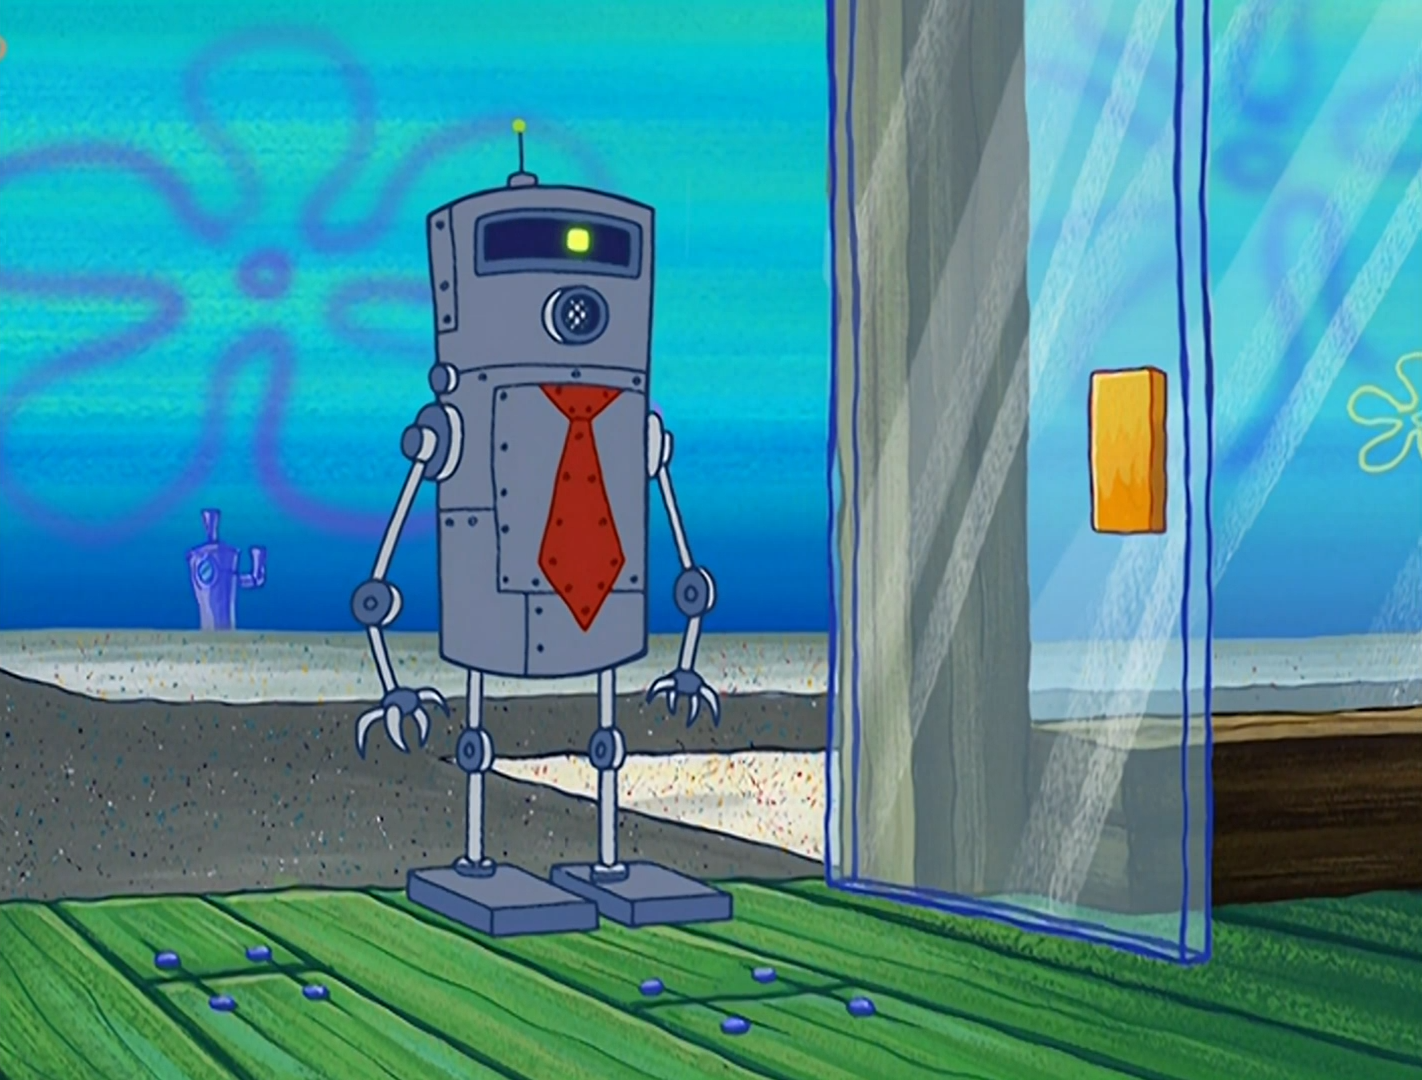 Plankton's robot